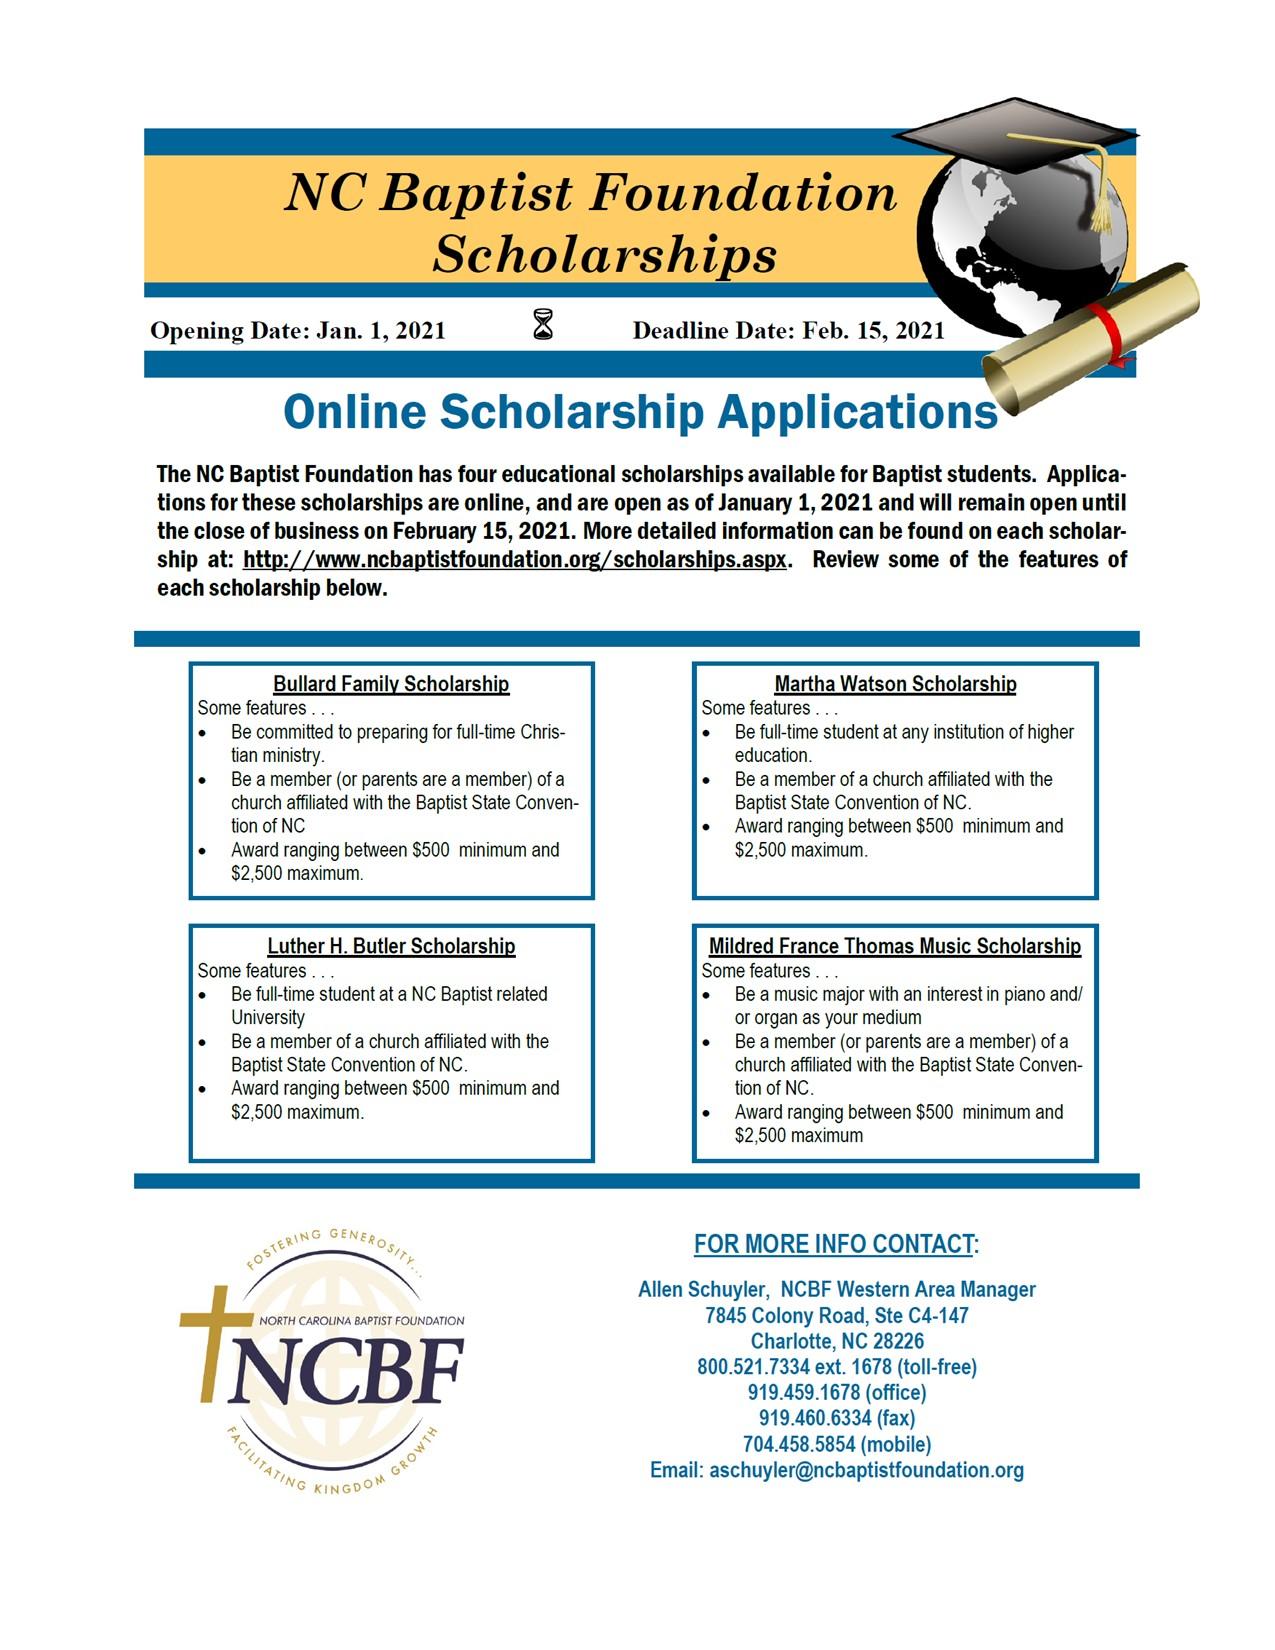 NC Baptist Foundation Scholarships 2021 3